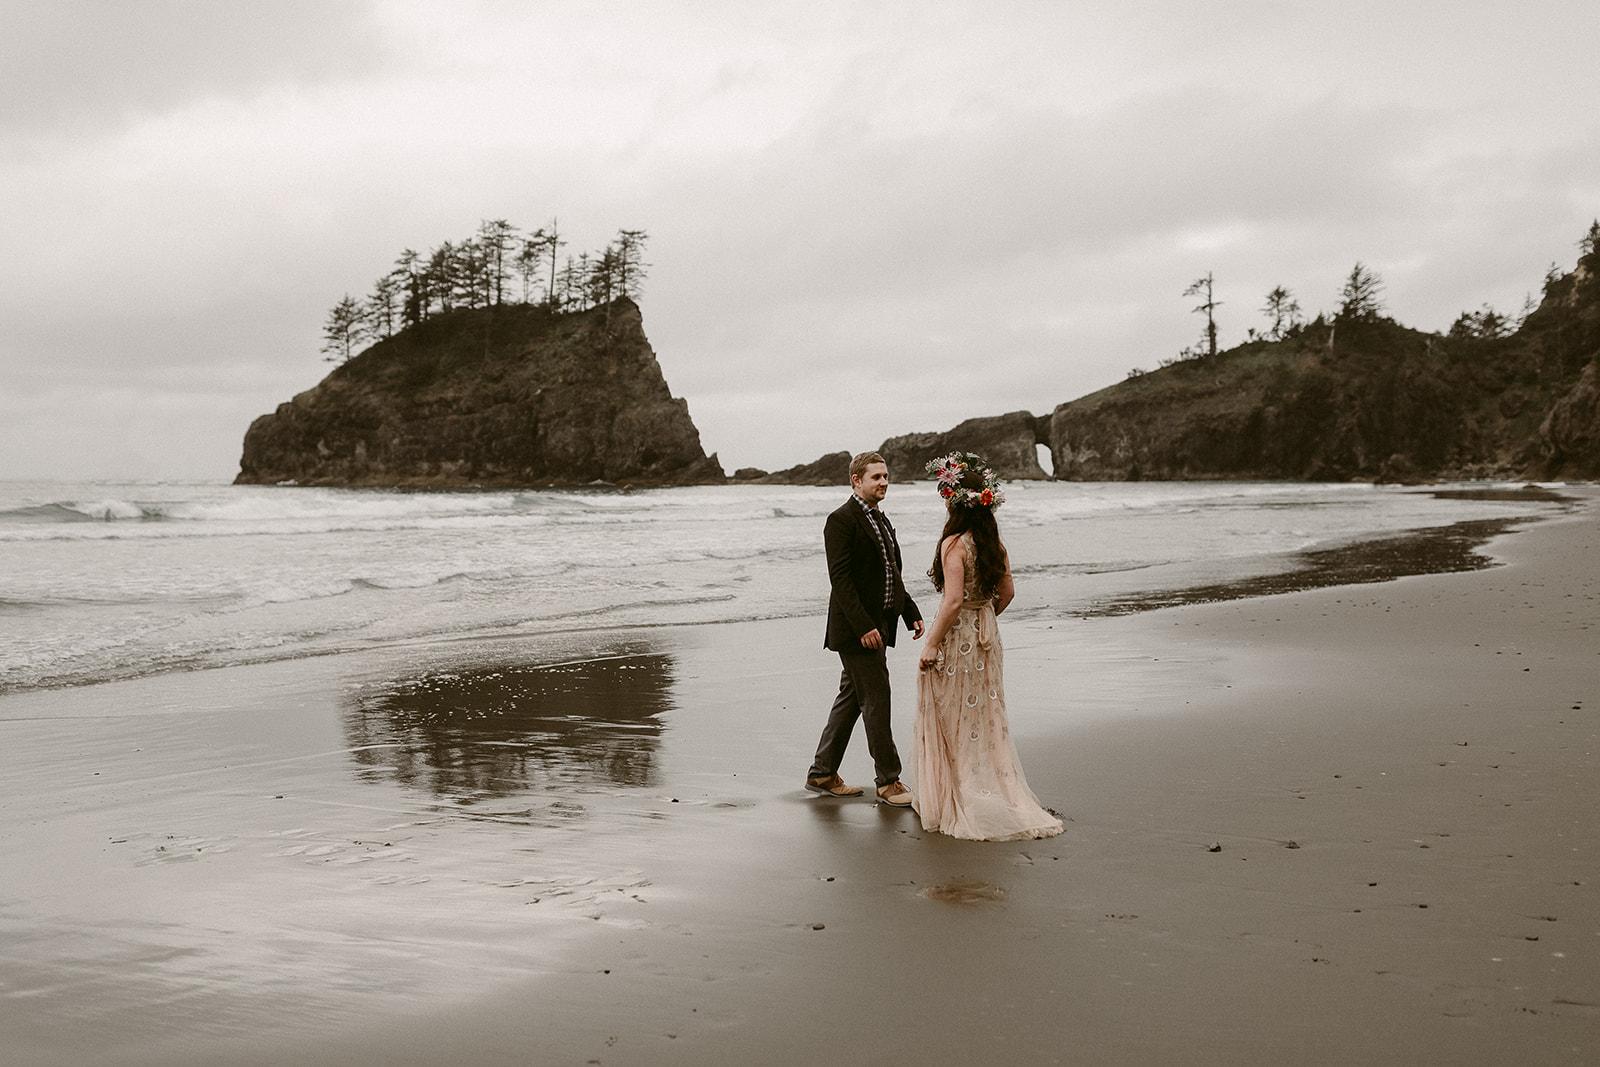 Garrett + Sarah_La Push WA_05 19 2018_0189.jpg